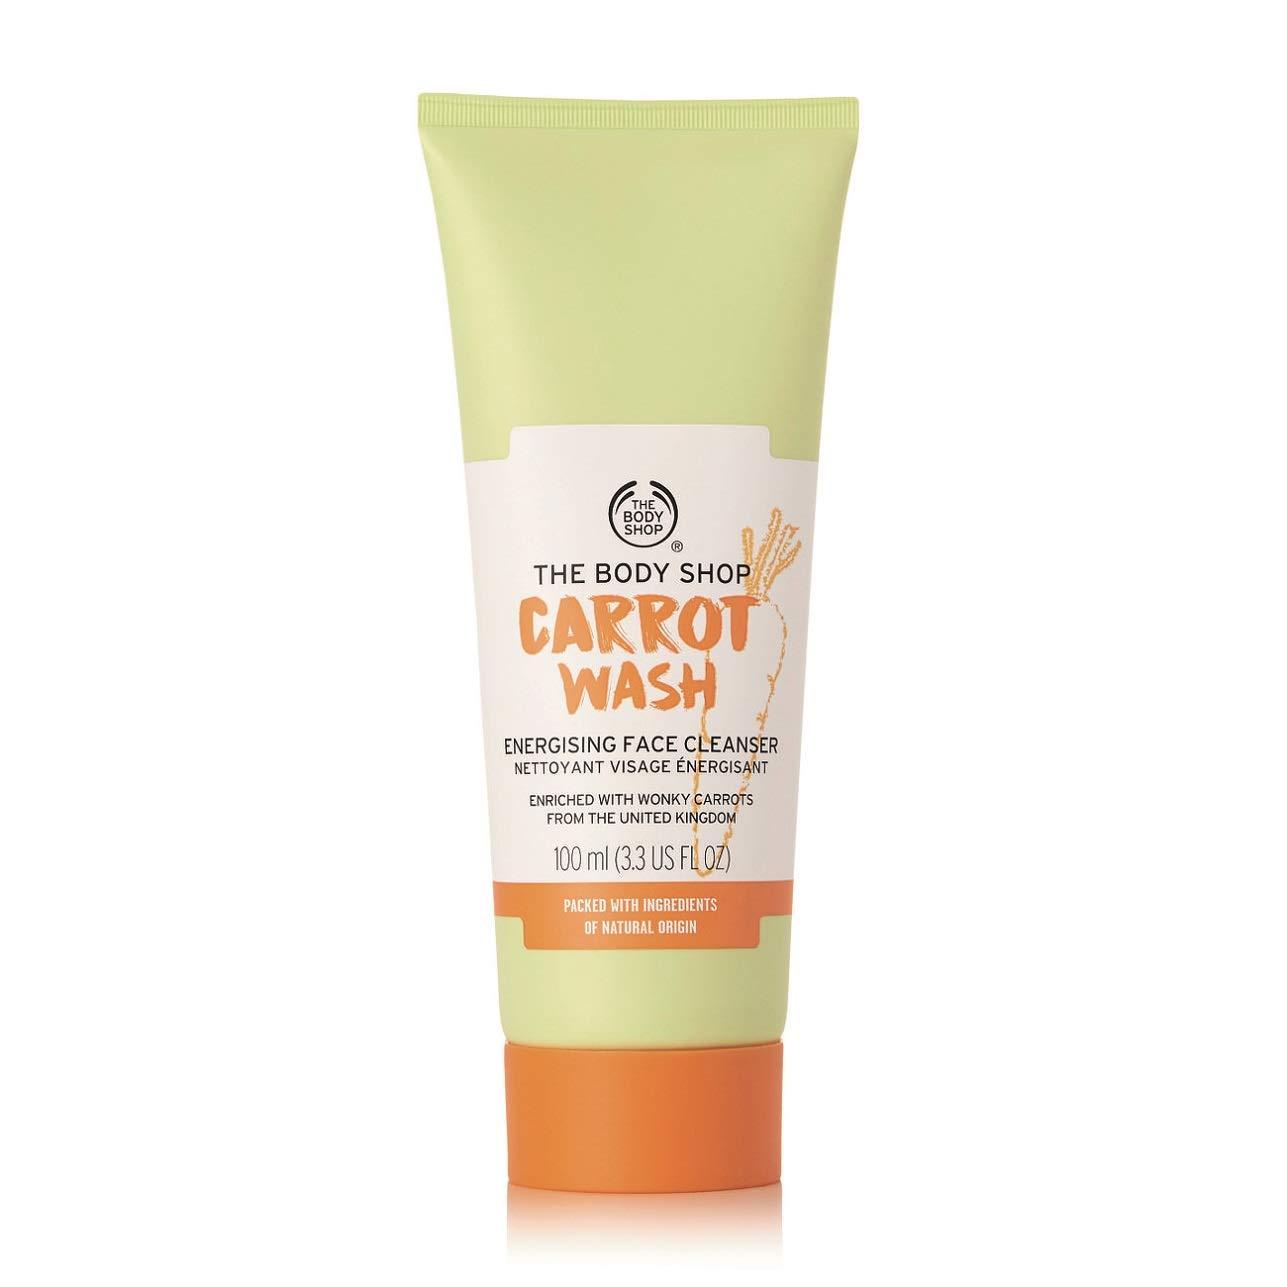 The Body Shop Carrot Face Wash, 3fl. Oz